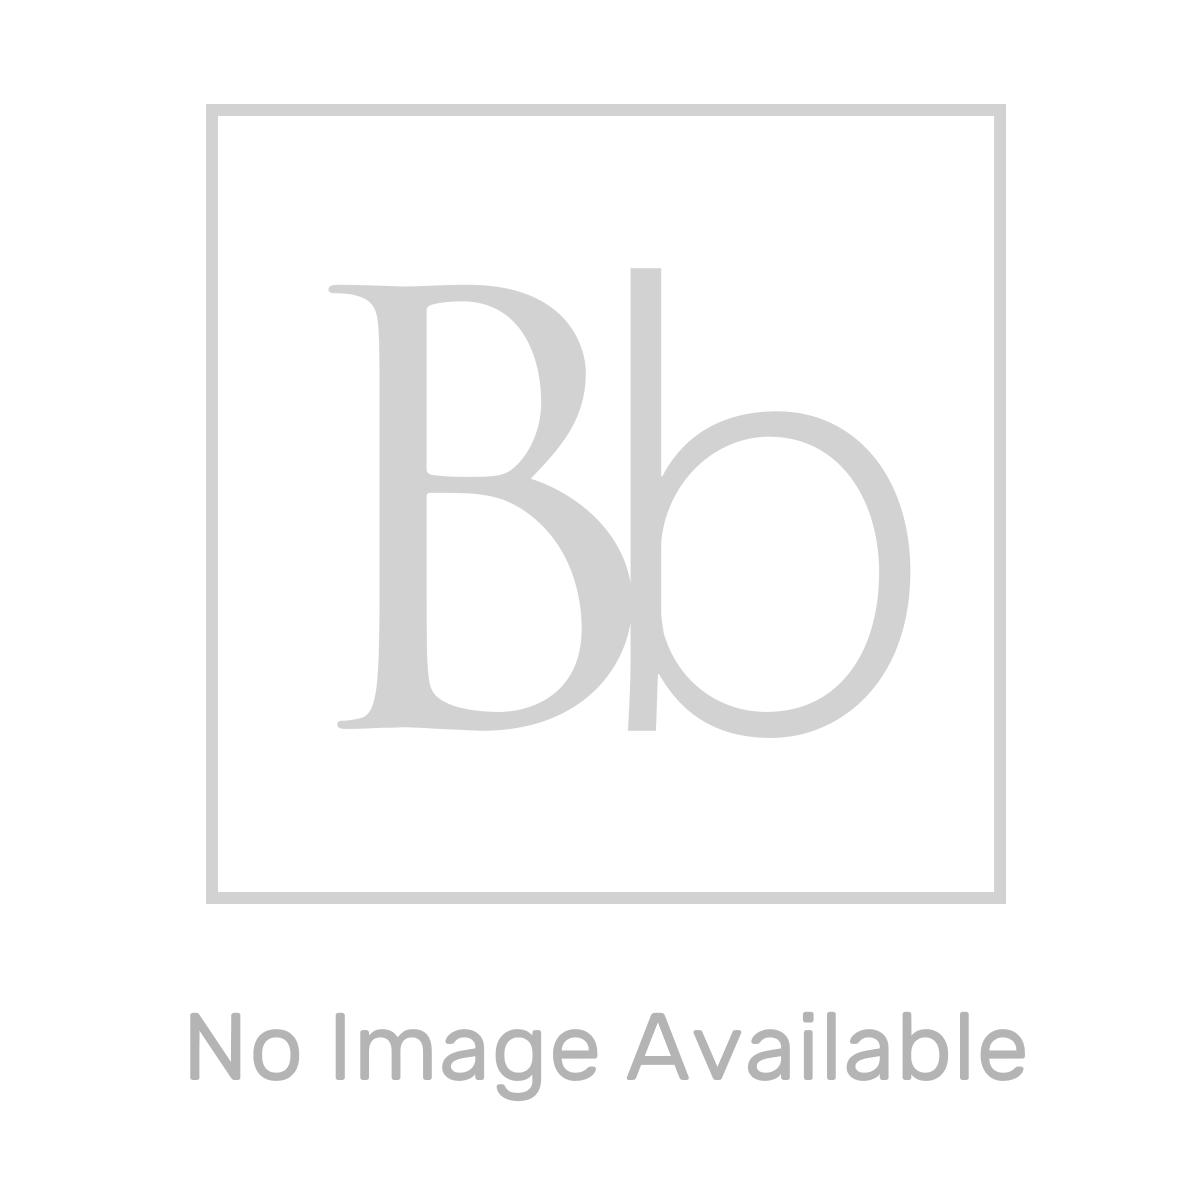 RAK Feeling Black Rectangular Shower Tray 1600 x 900mm Measurements